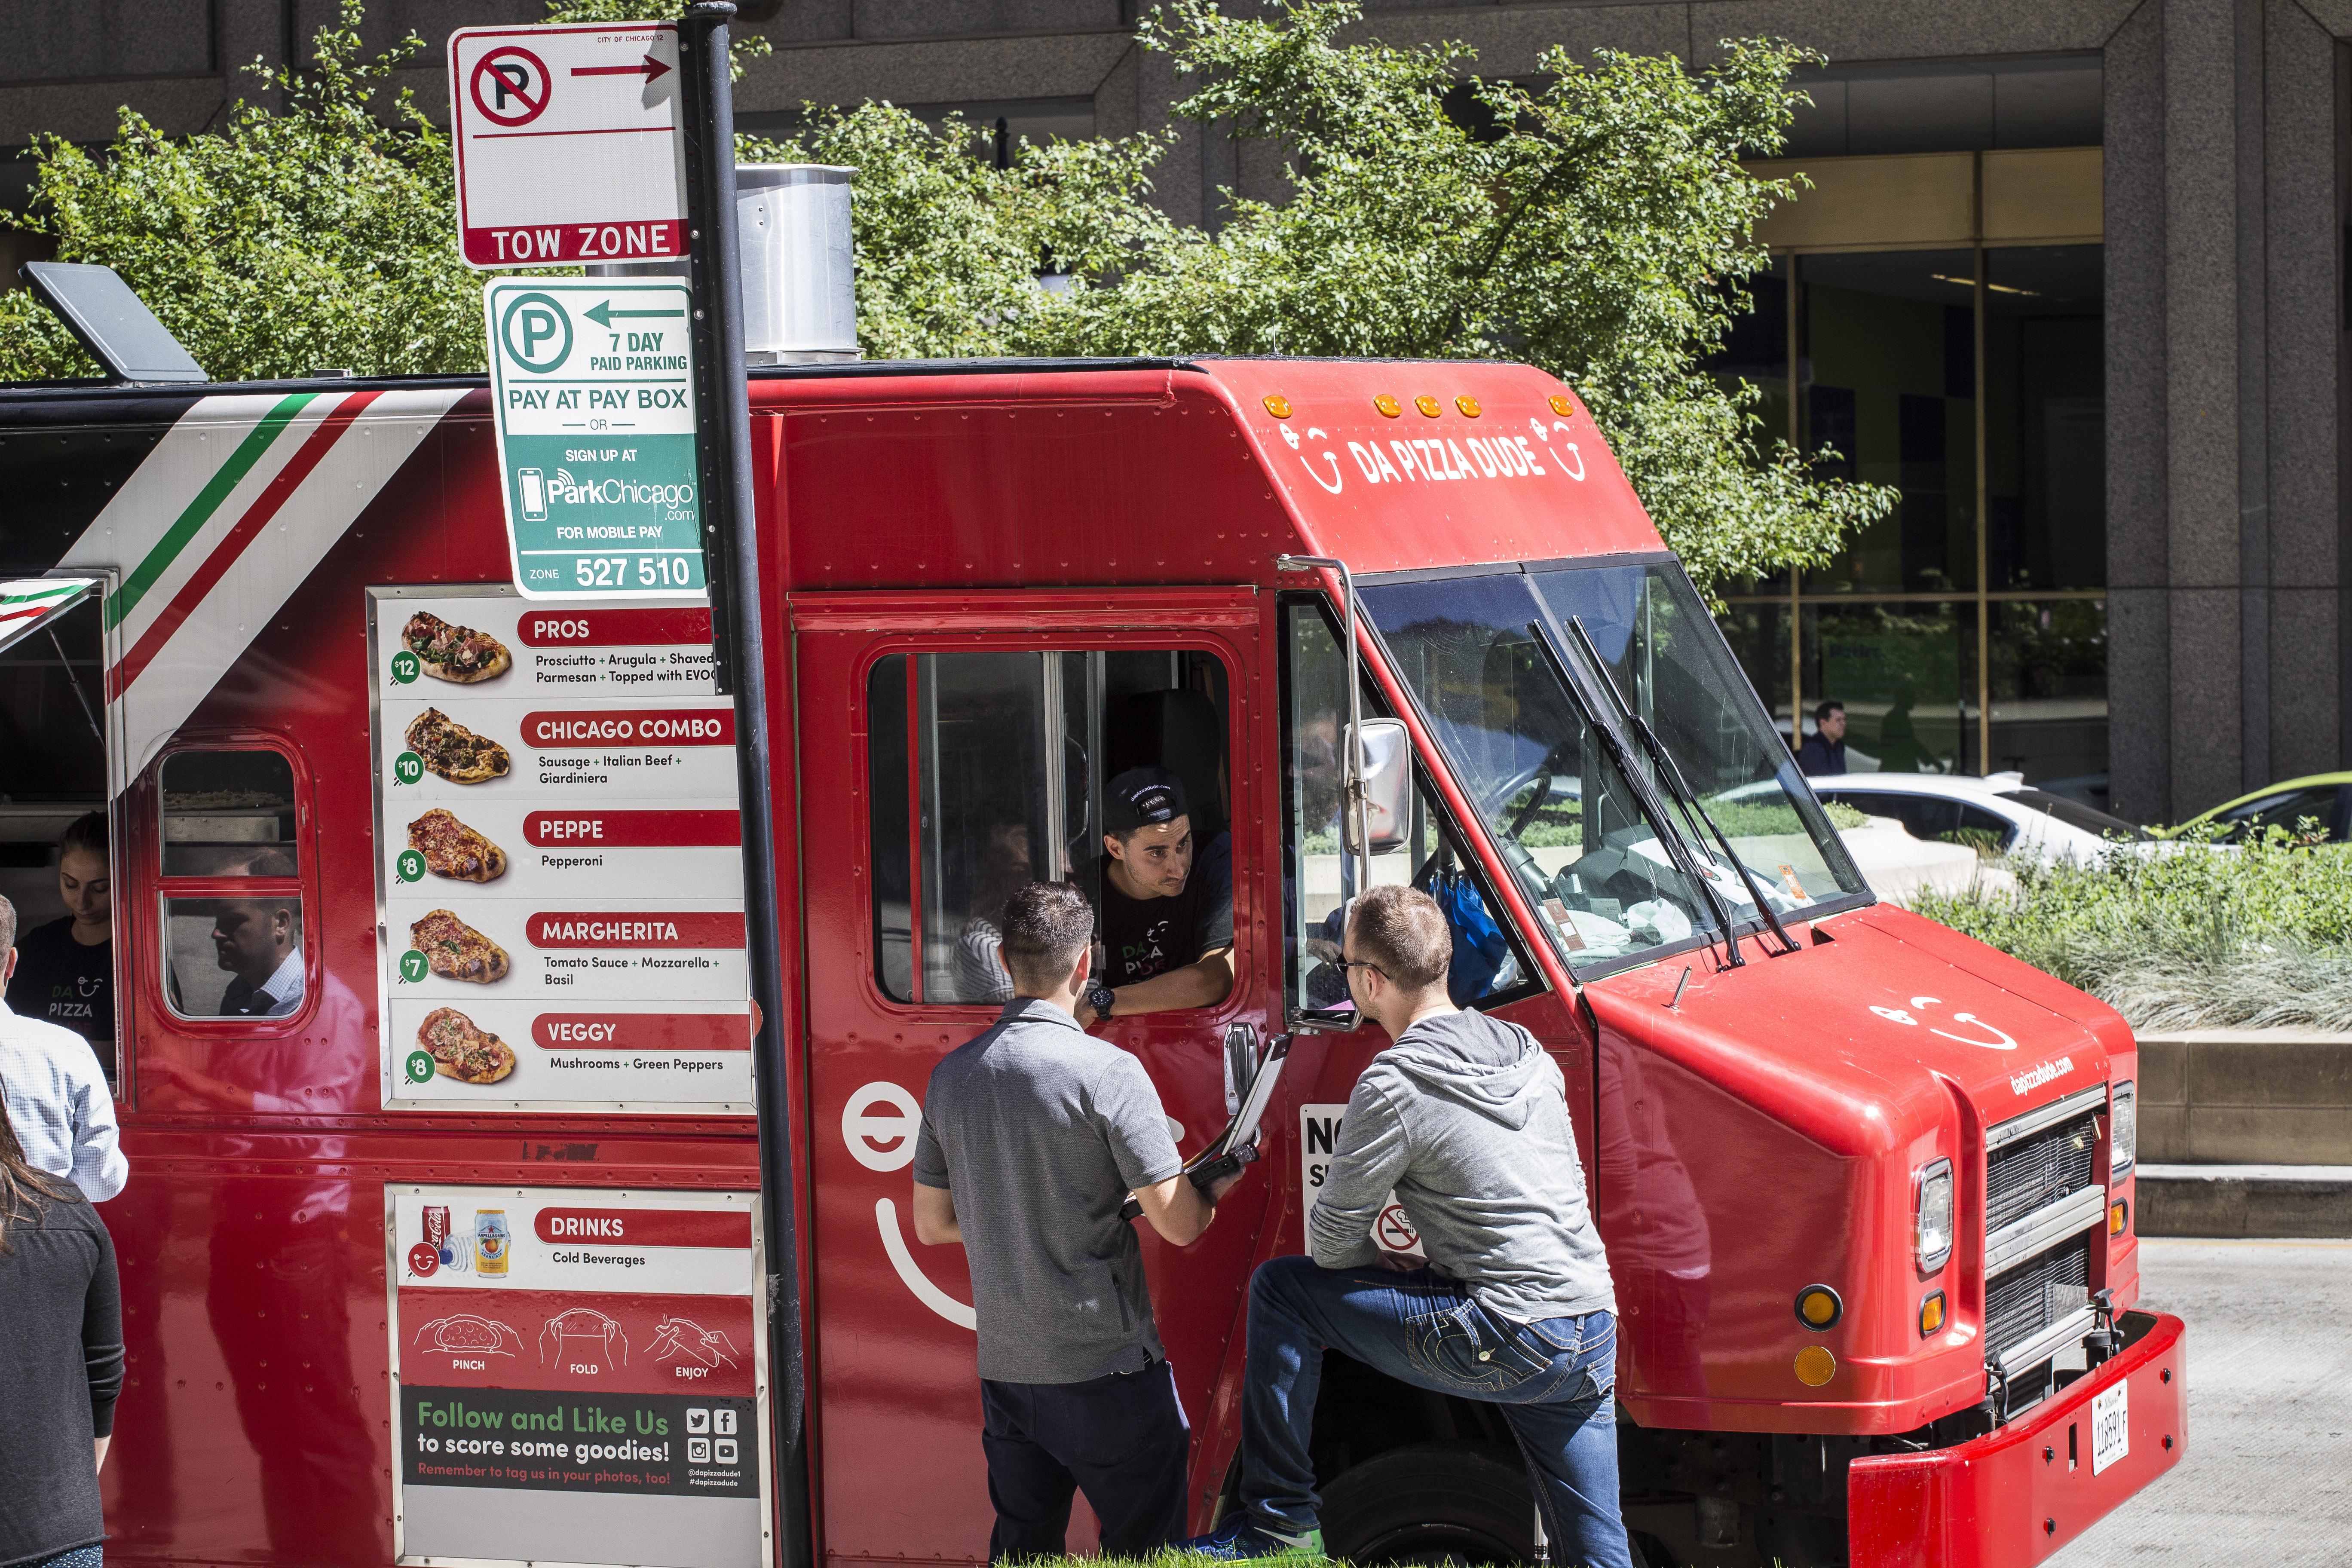 City inspectors check licenses of food trucks on Wacker Drive.